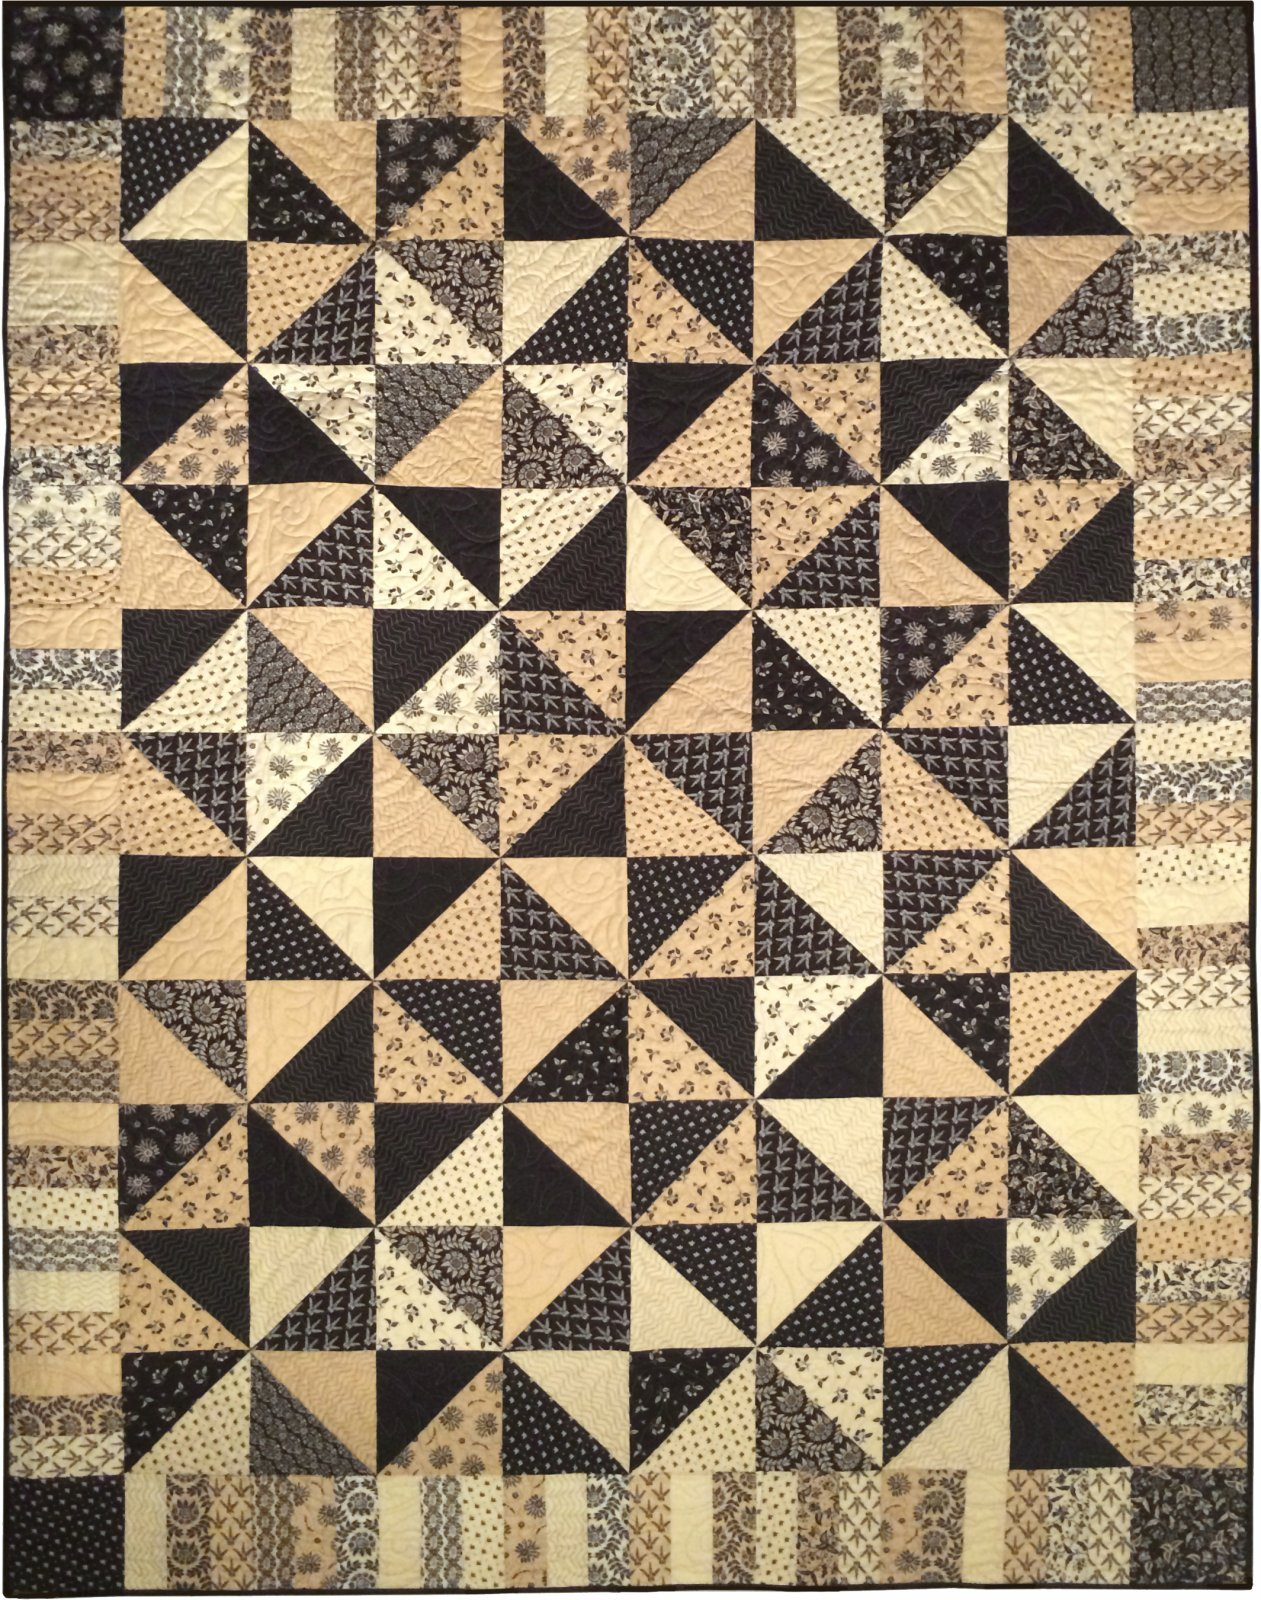 KS1505 Brimfield Pattern Kathy Schmitz Moda